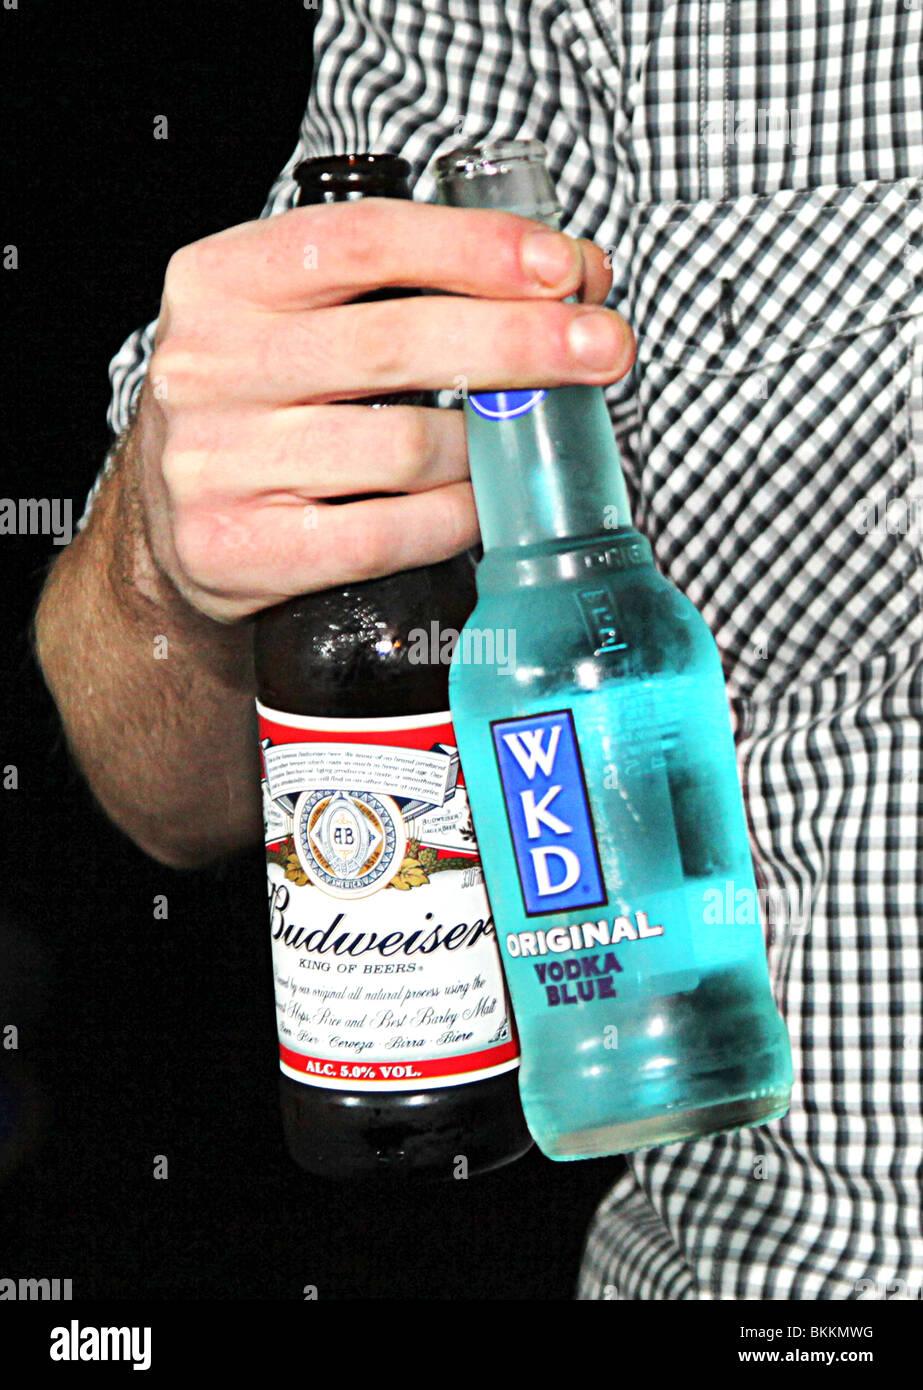 Man drinking wkd original and budweiser - Stock Image